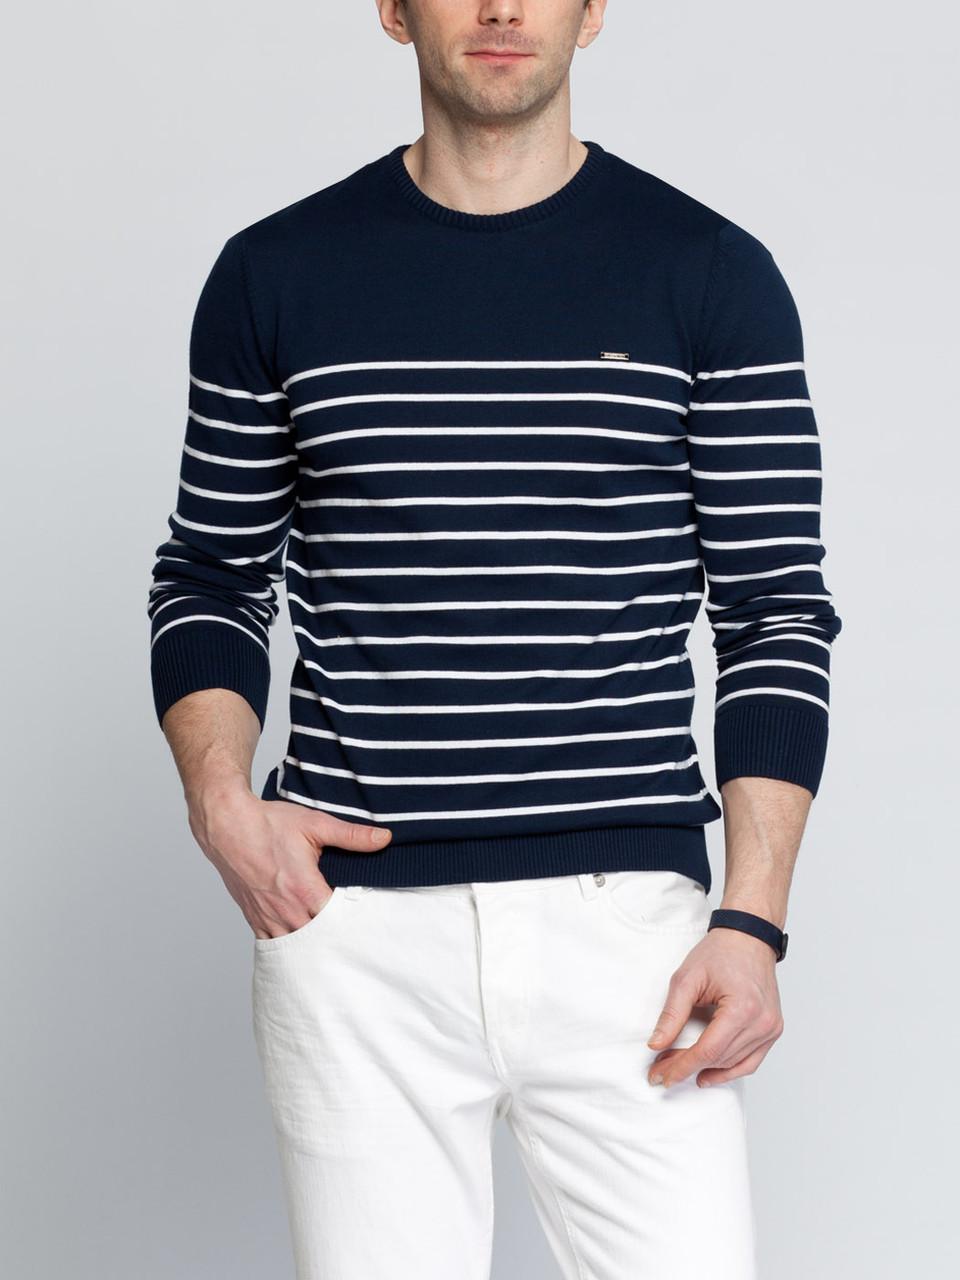 Мужской свитер синий LC Waikiki / ЛС Вайкики в белые полоски